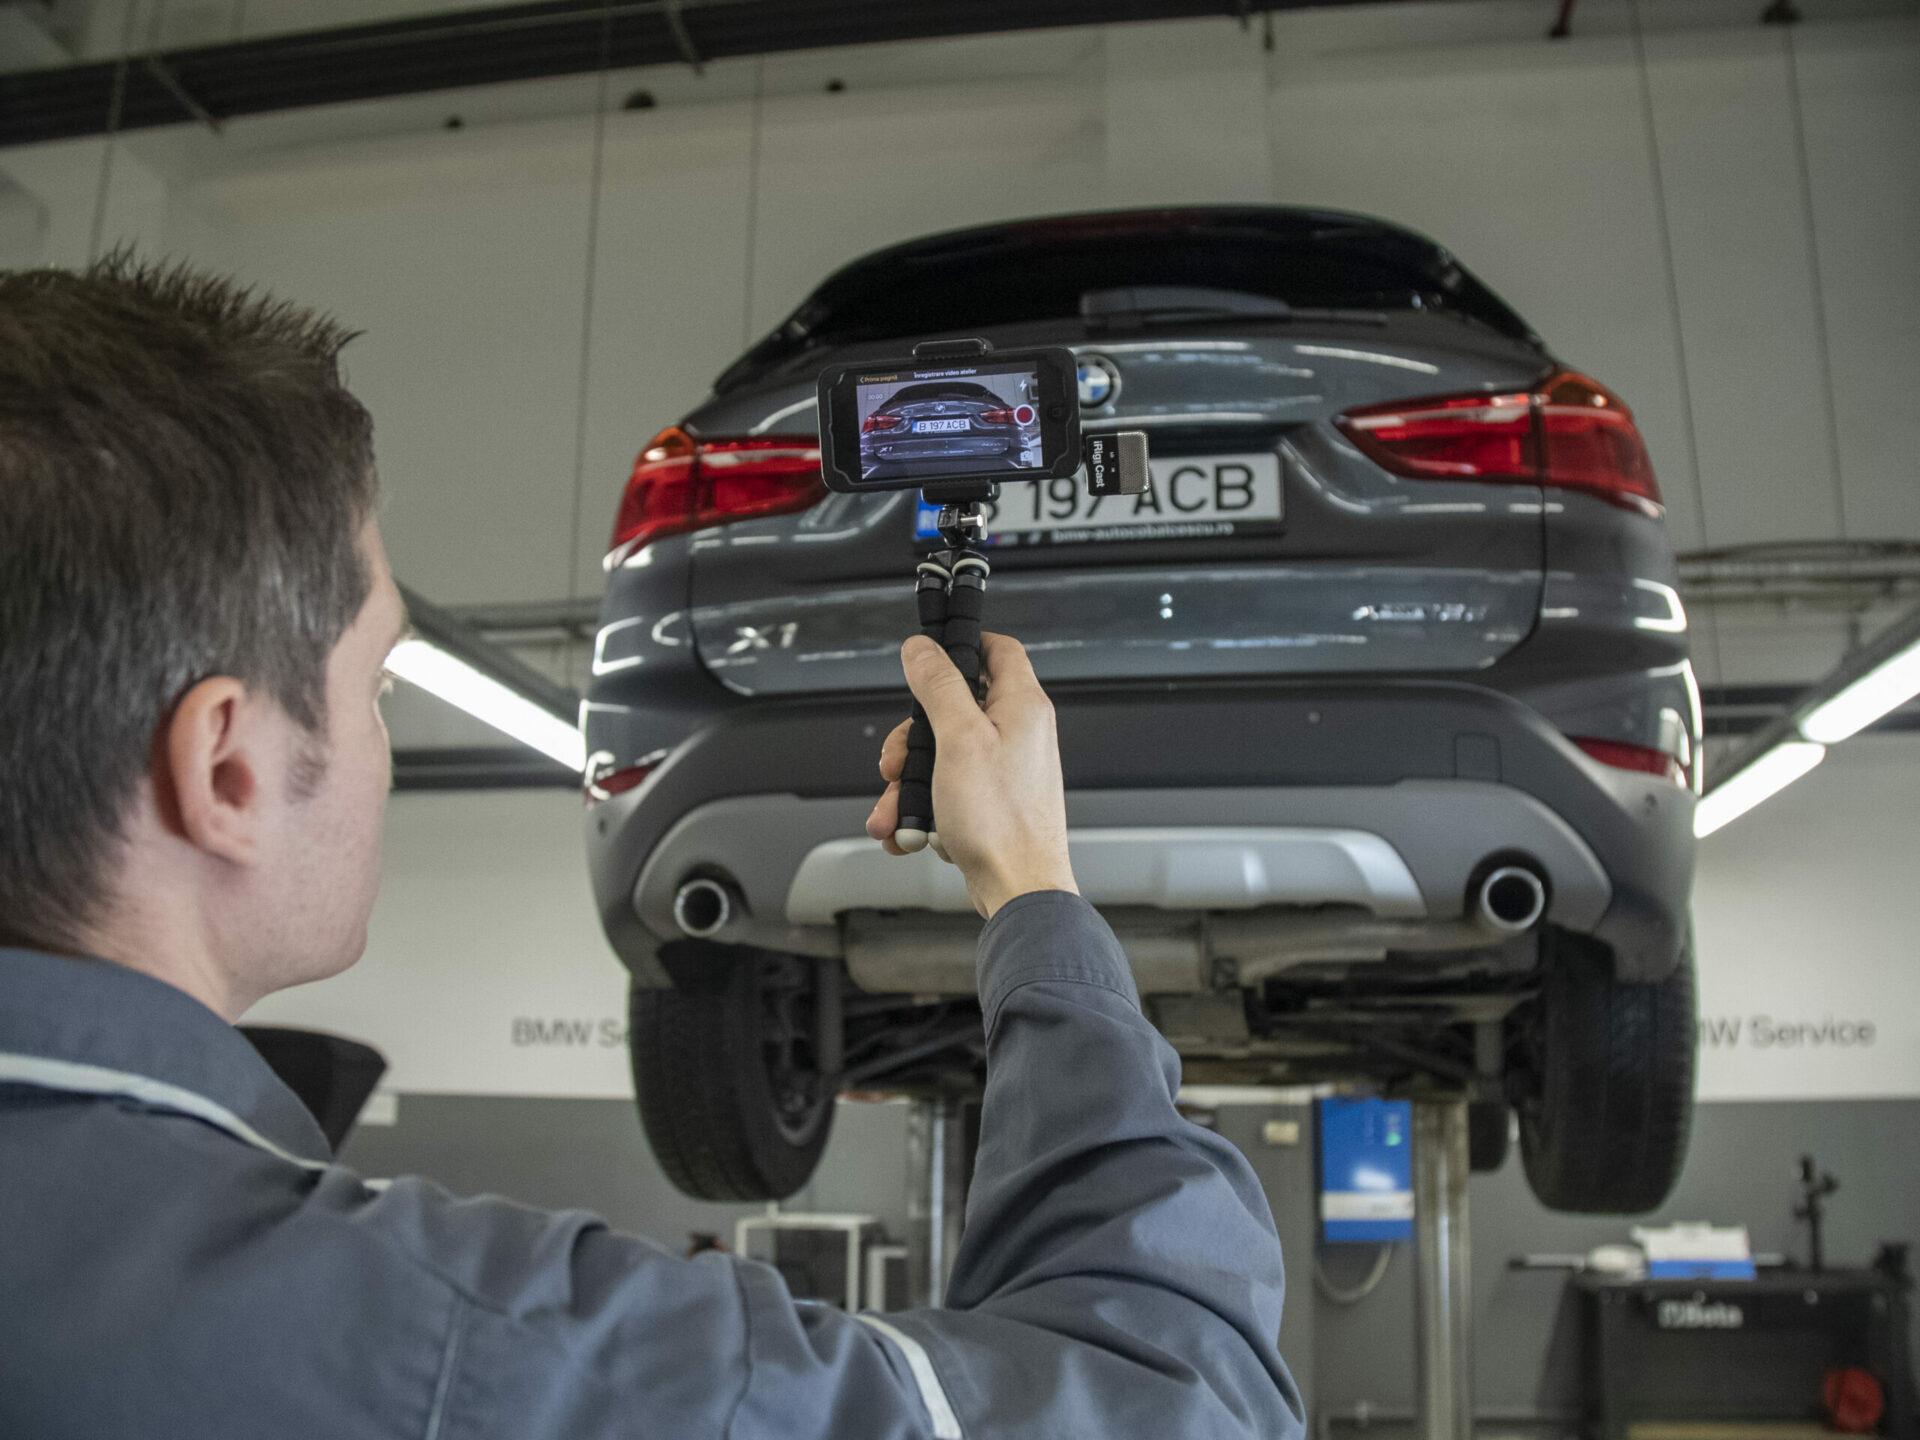 BMW-Smart-Video-Communication